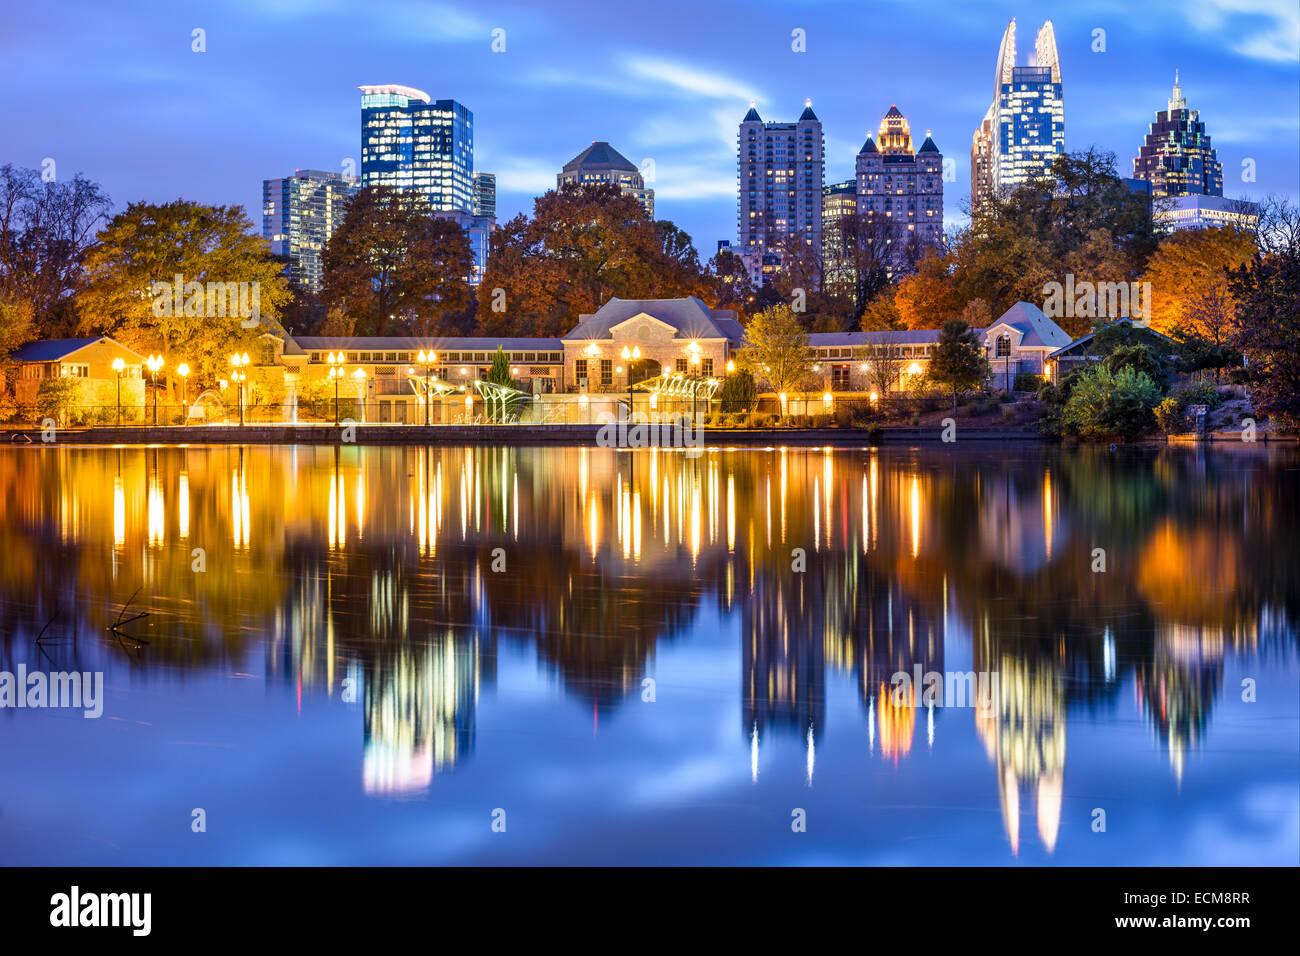 Atlanta, Georgia, USA Innenstadt Skyline bei Piedmont Park See Meer. Stockbild